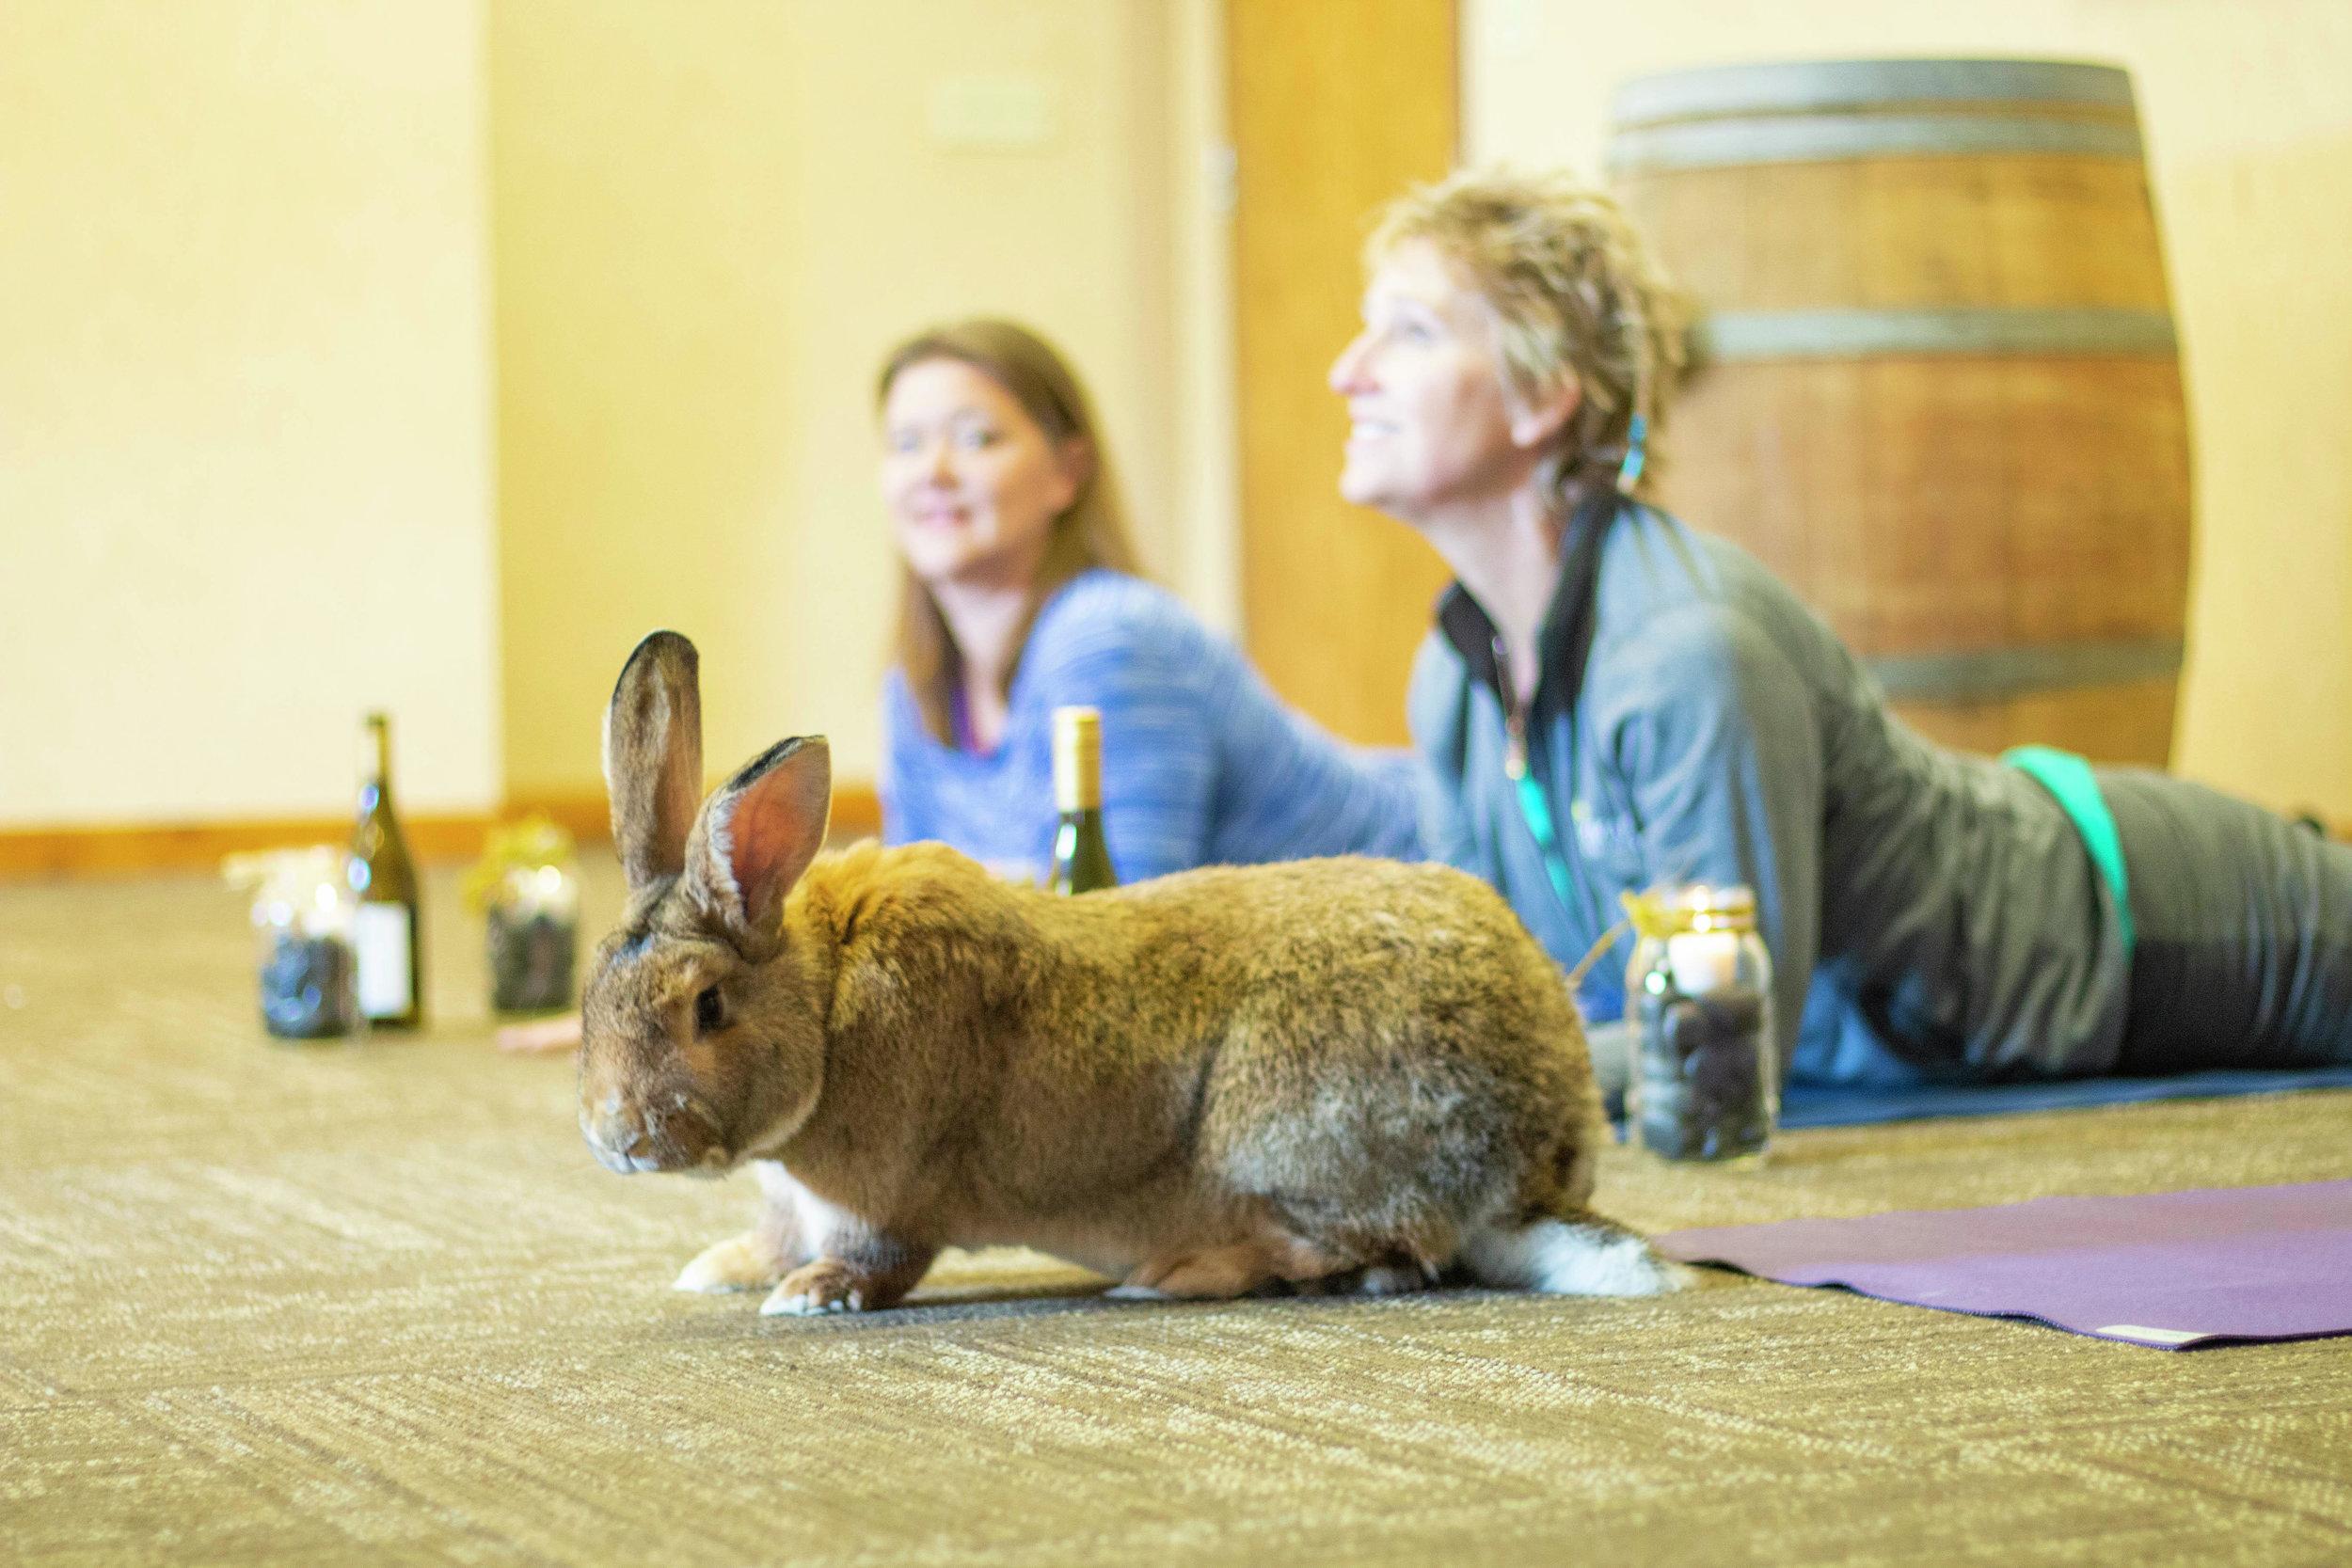 Lara Parkin of Karmady Yoga and Jill Mattson of Uplifted Wellness Studio enjoy a session of Hoppy Hour Yoga. Submitted photo